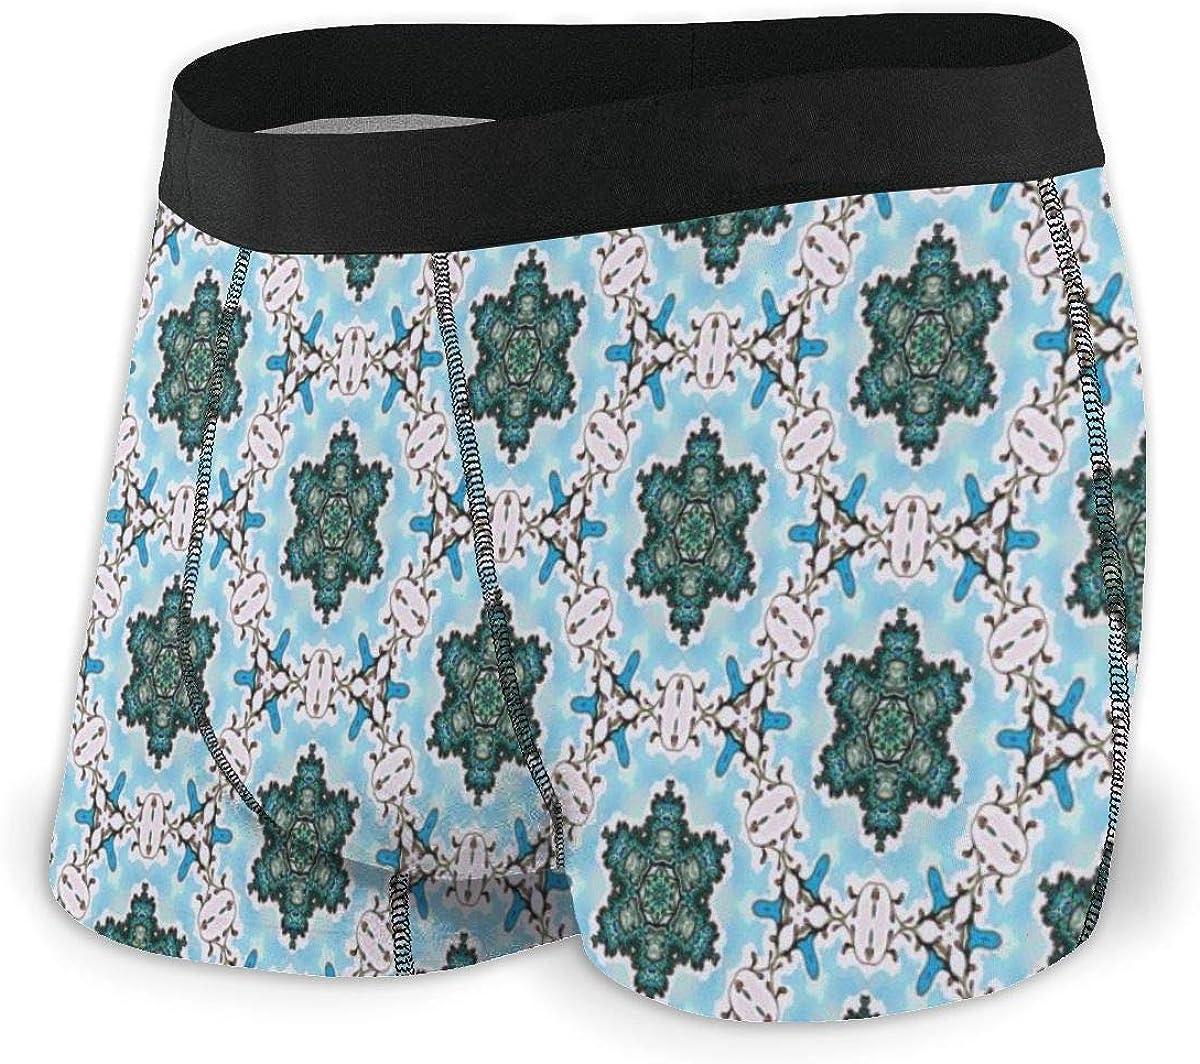 Mens Boxer Briefs Classic Luxury and Elegant Popular Modern Breathable Underwear